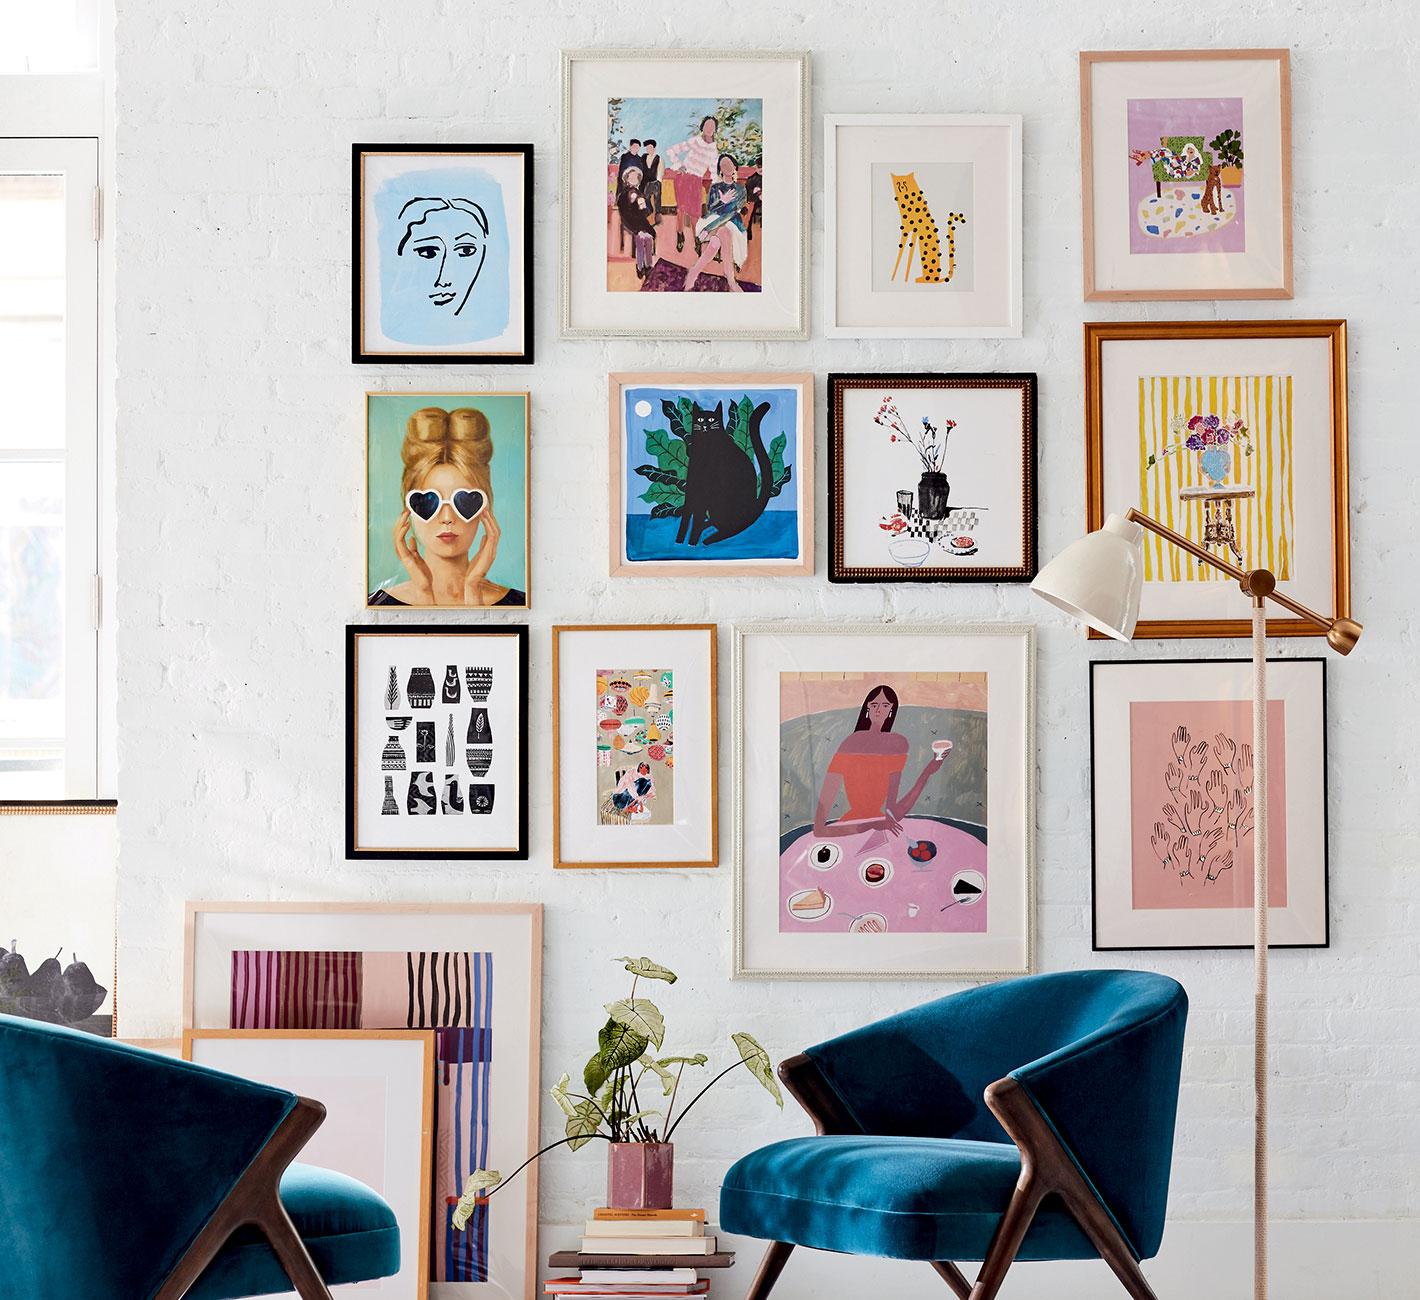 Design Framed Wall Art